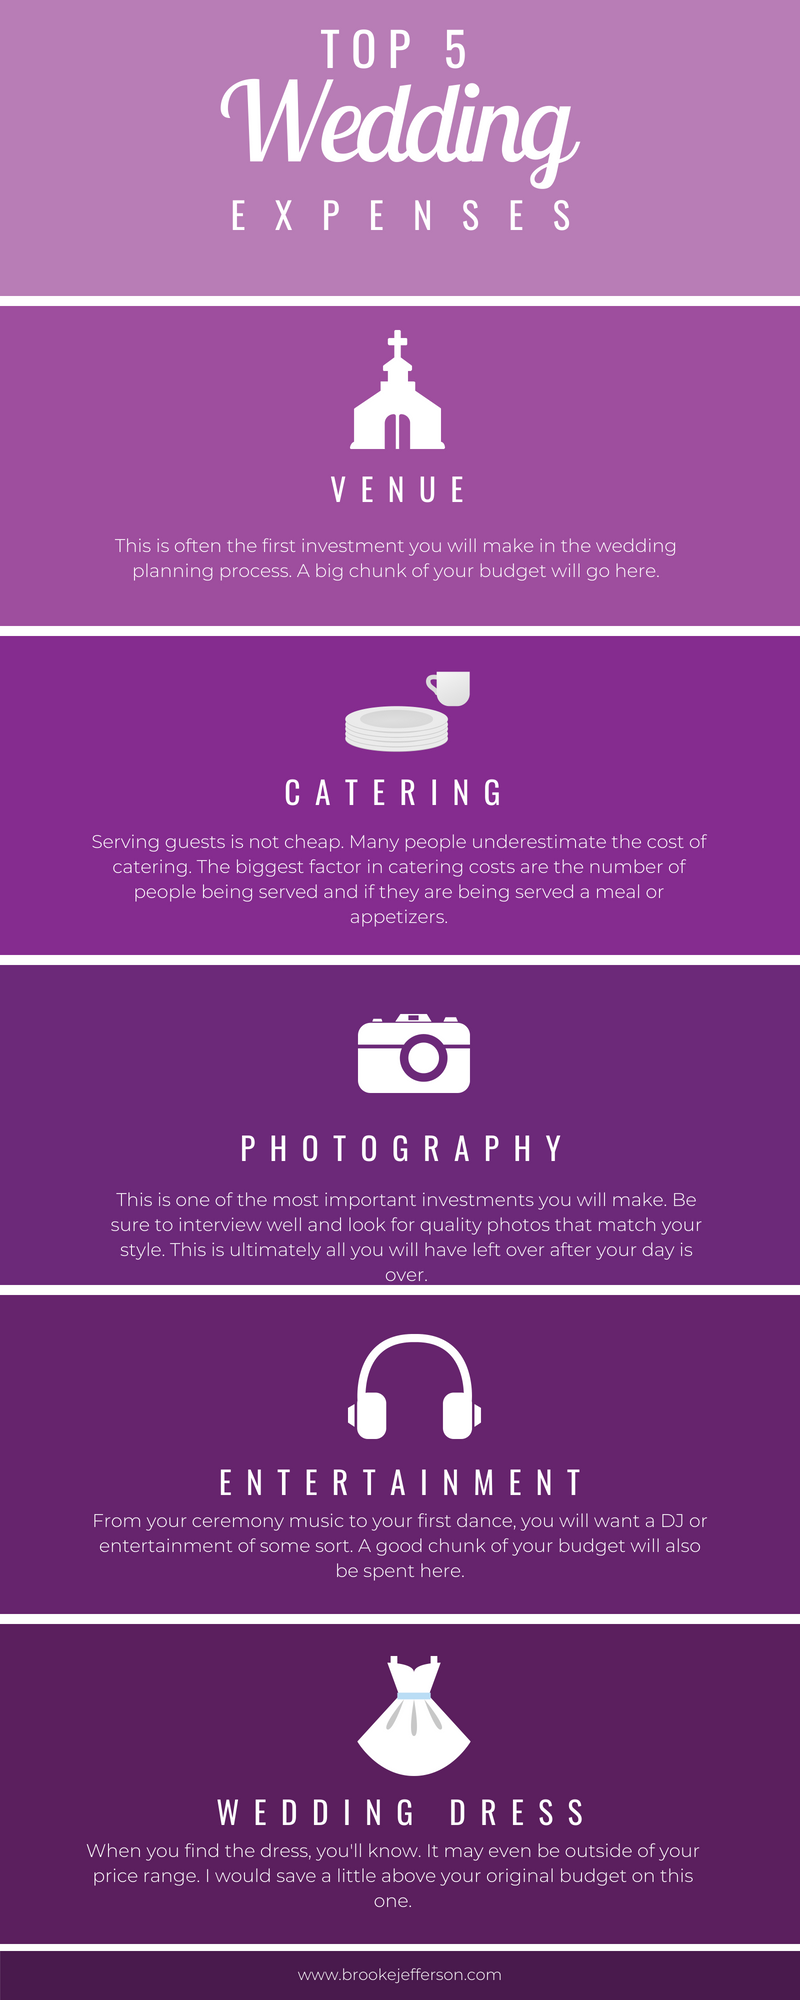 wedding expenses breakdown tips It's no secret throwing a